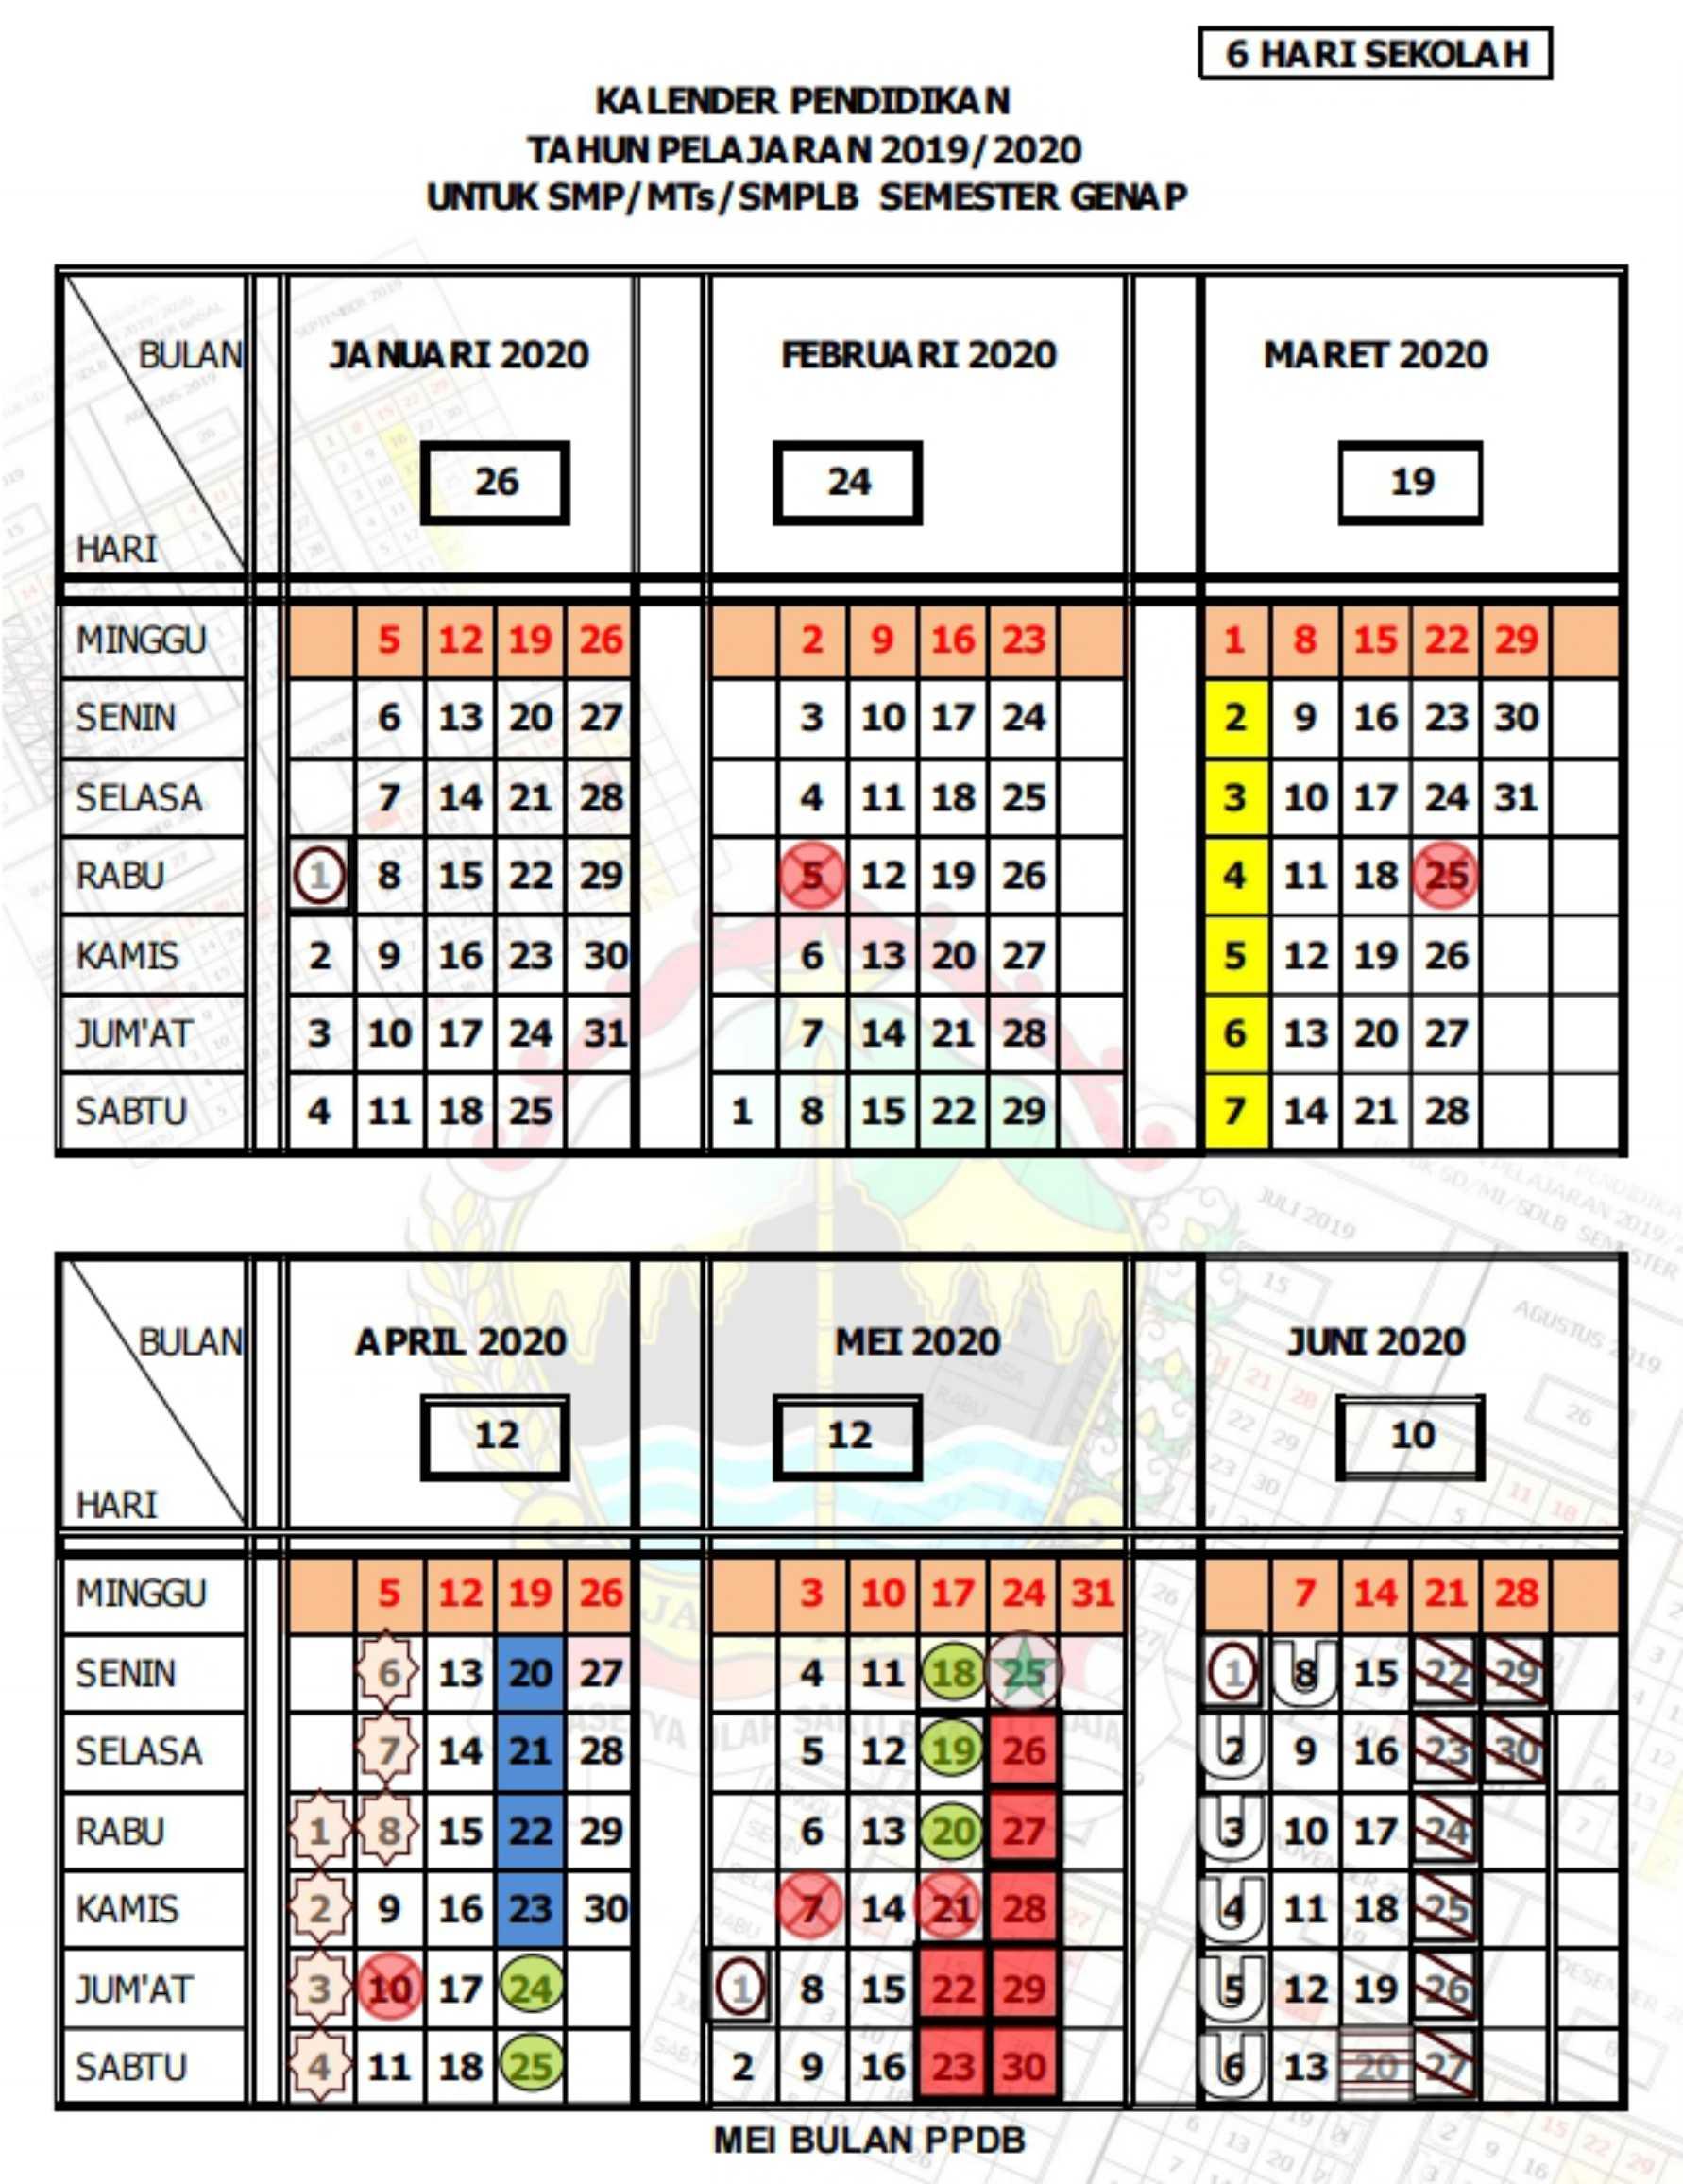 kalender pendidikan tahun pelajaran 2019 - 2020 semester genap SMP SMPLB MTs (6 hari sekolah) provinsi jawa tengah